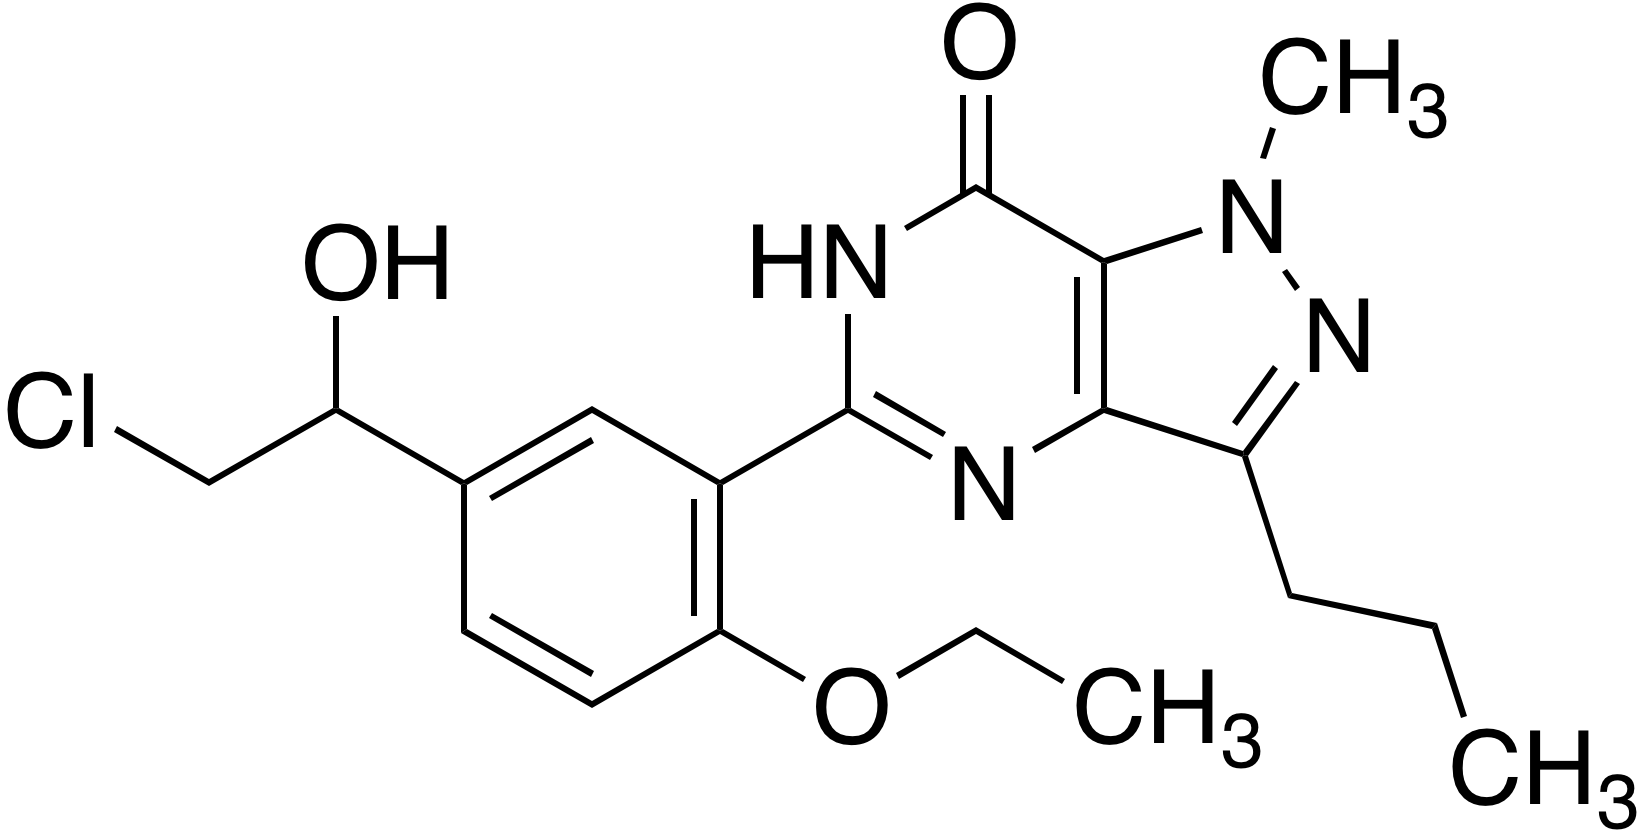 Hydroxy chlorodenafil